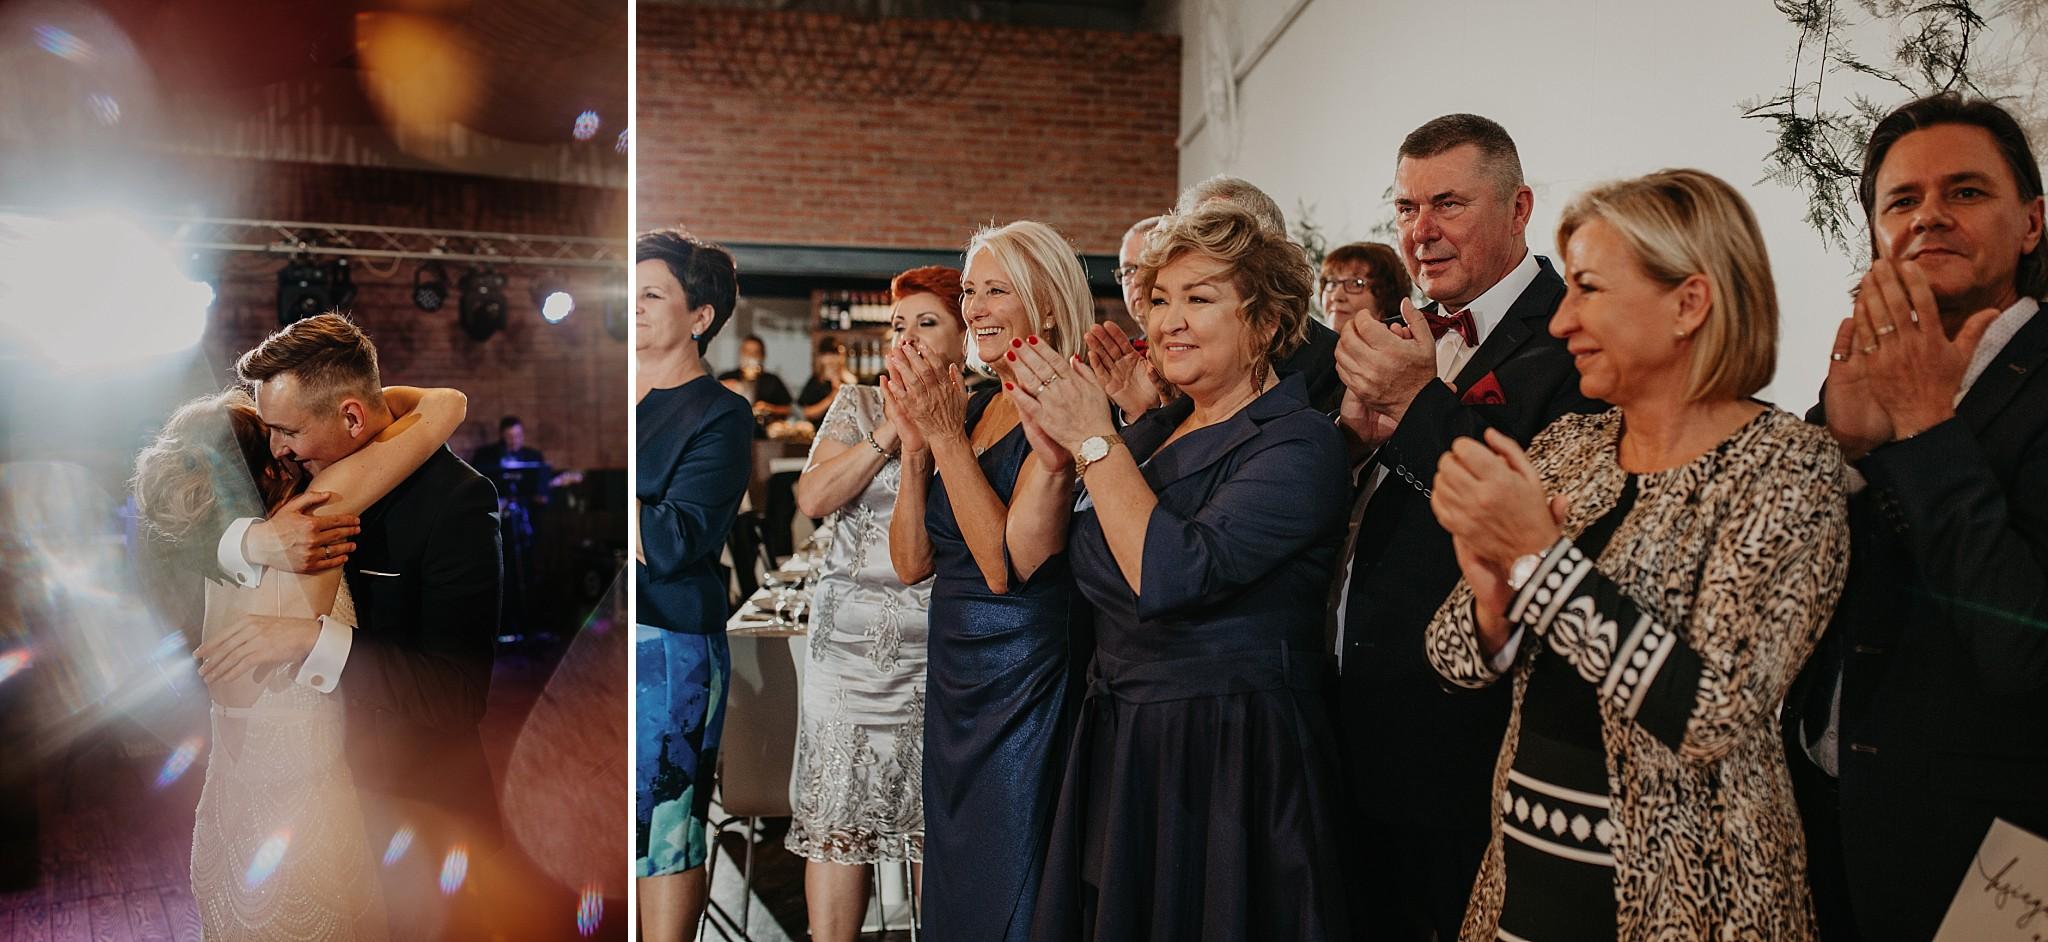 fotograf poznan wesele dobra truskawka piekne wesele pod poznaniem wesele w dobrej truskawce piekna para mloda slub marzen slub koronawirus slub listopad wesele koronawirus 326